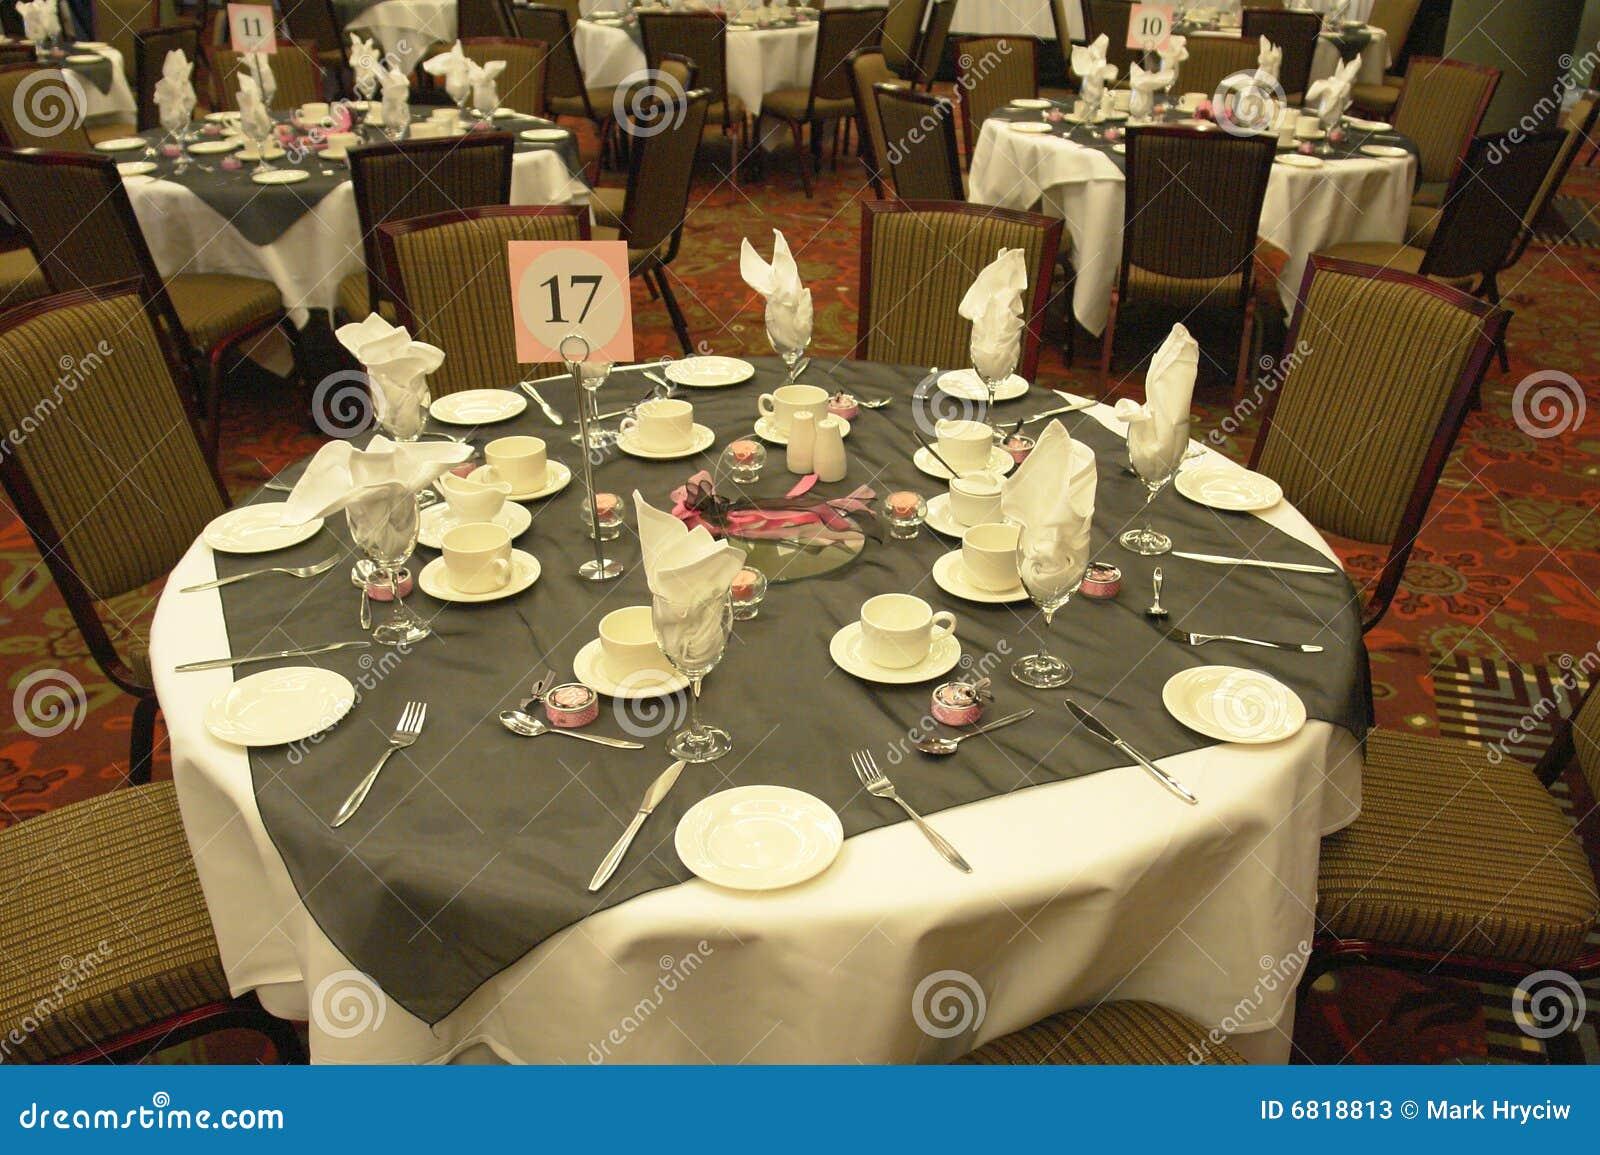 Wedding Table Settings Stock Photos Image 6818813